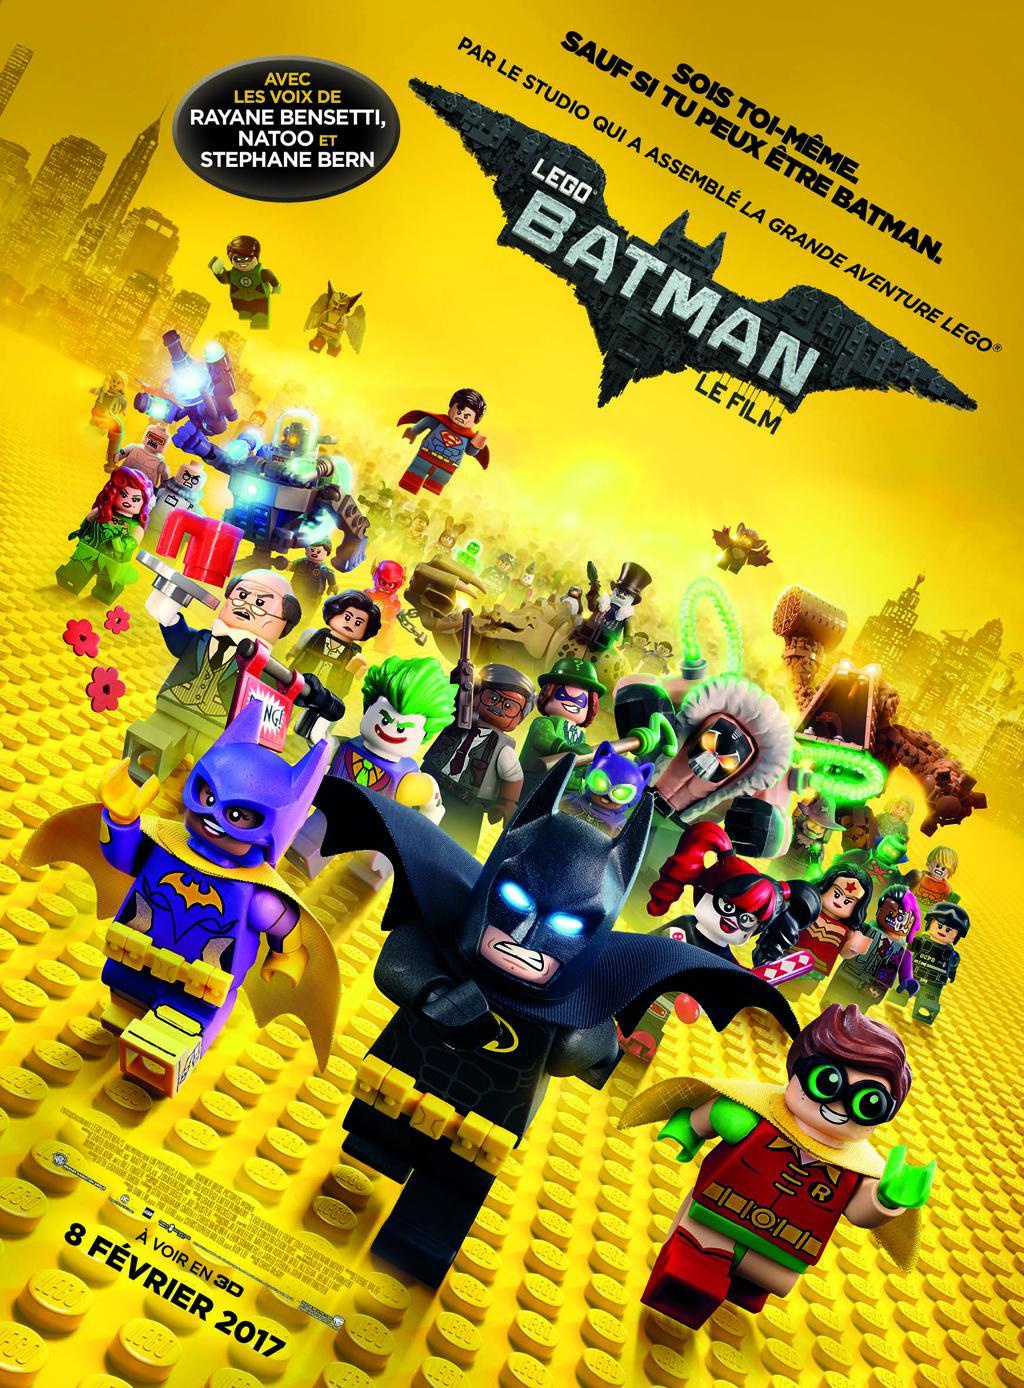 Critique De Lego Batman Le Film Le Spin Off De La